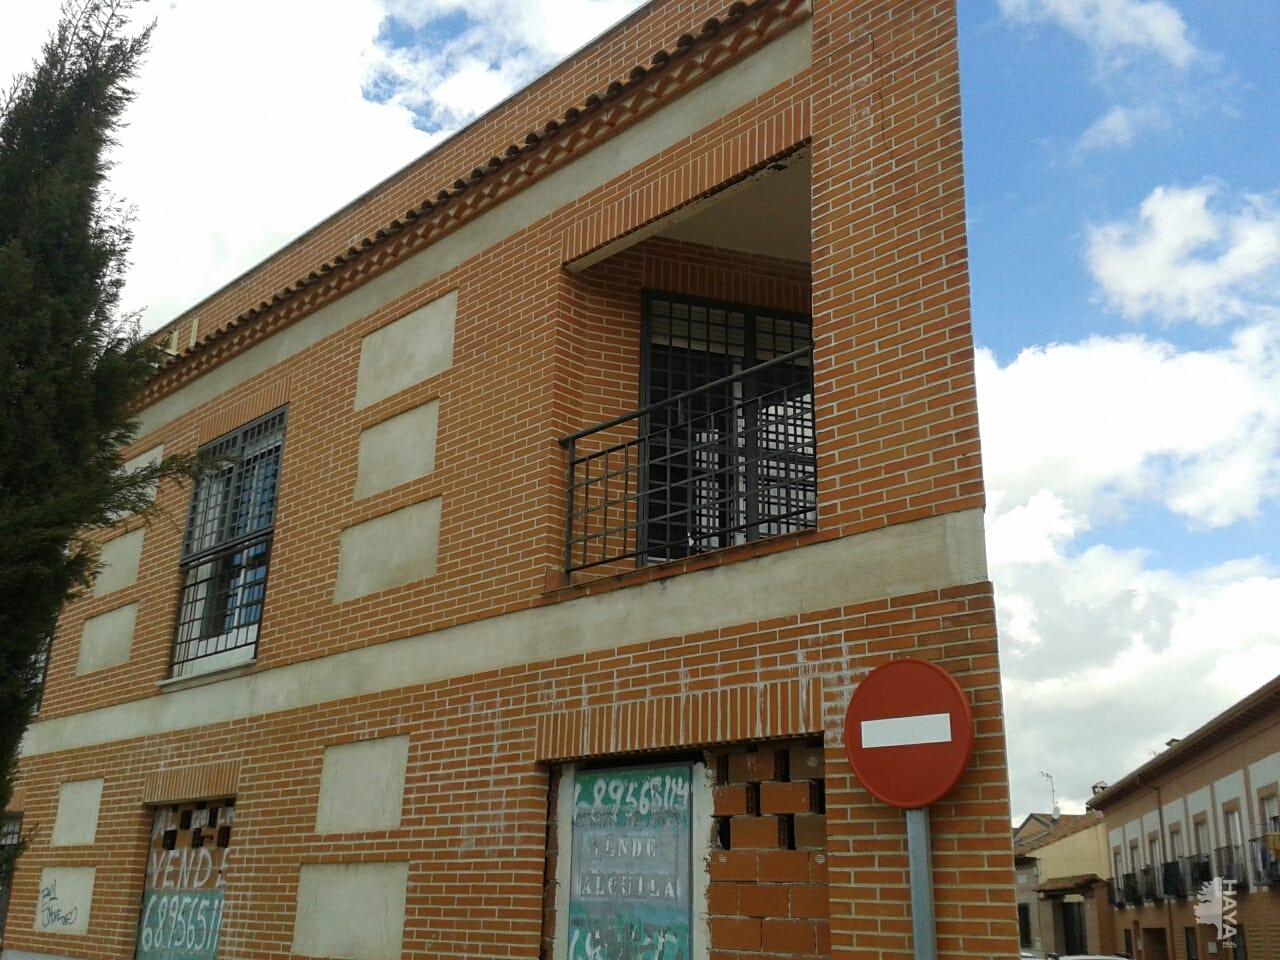 Piso en venta en La Cardosa, Valdeavero, Madrid, Calle la Fragua, 138.527 €, 2 habitaciones, 1 baño, 104 m2